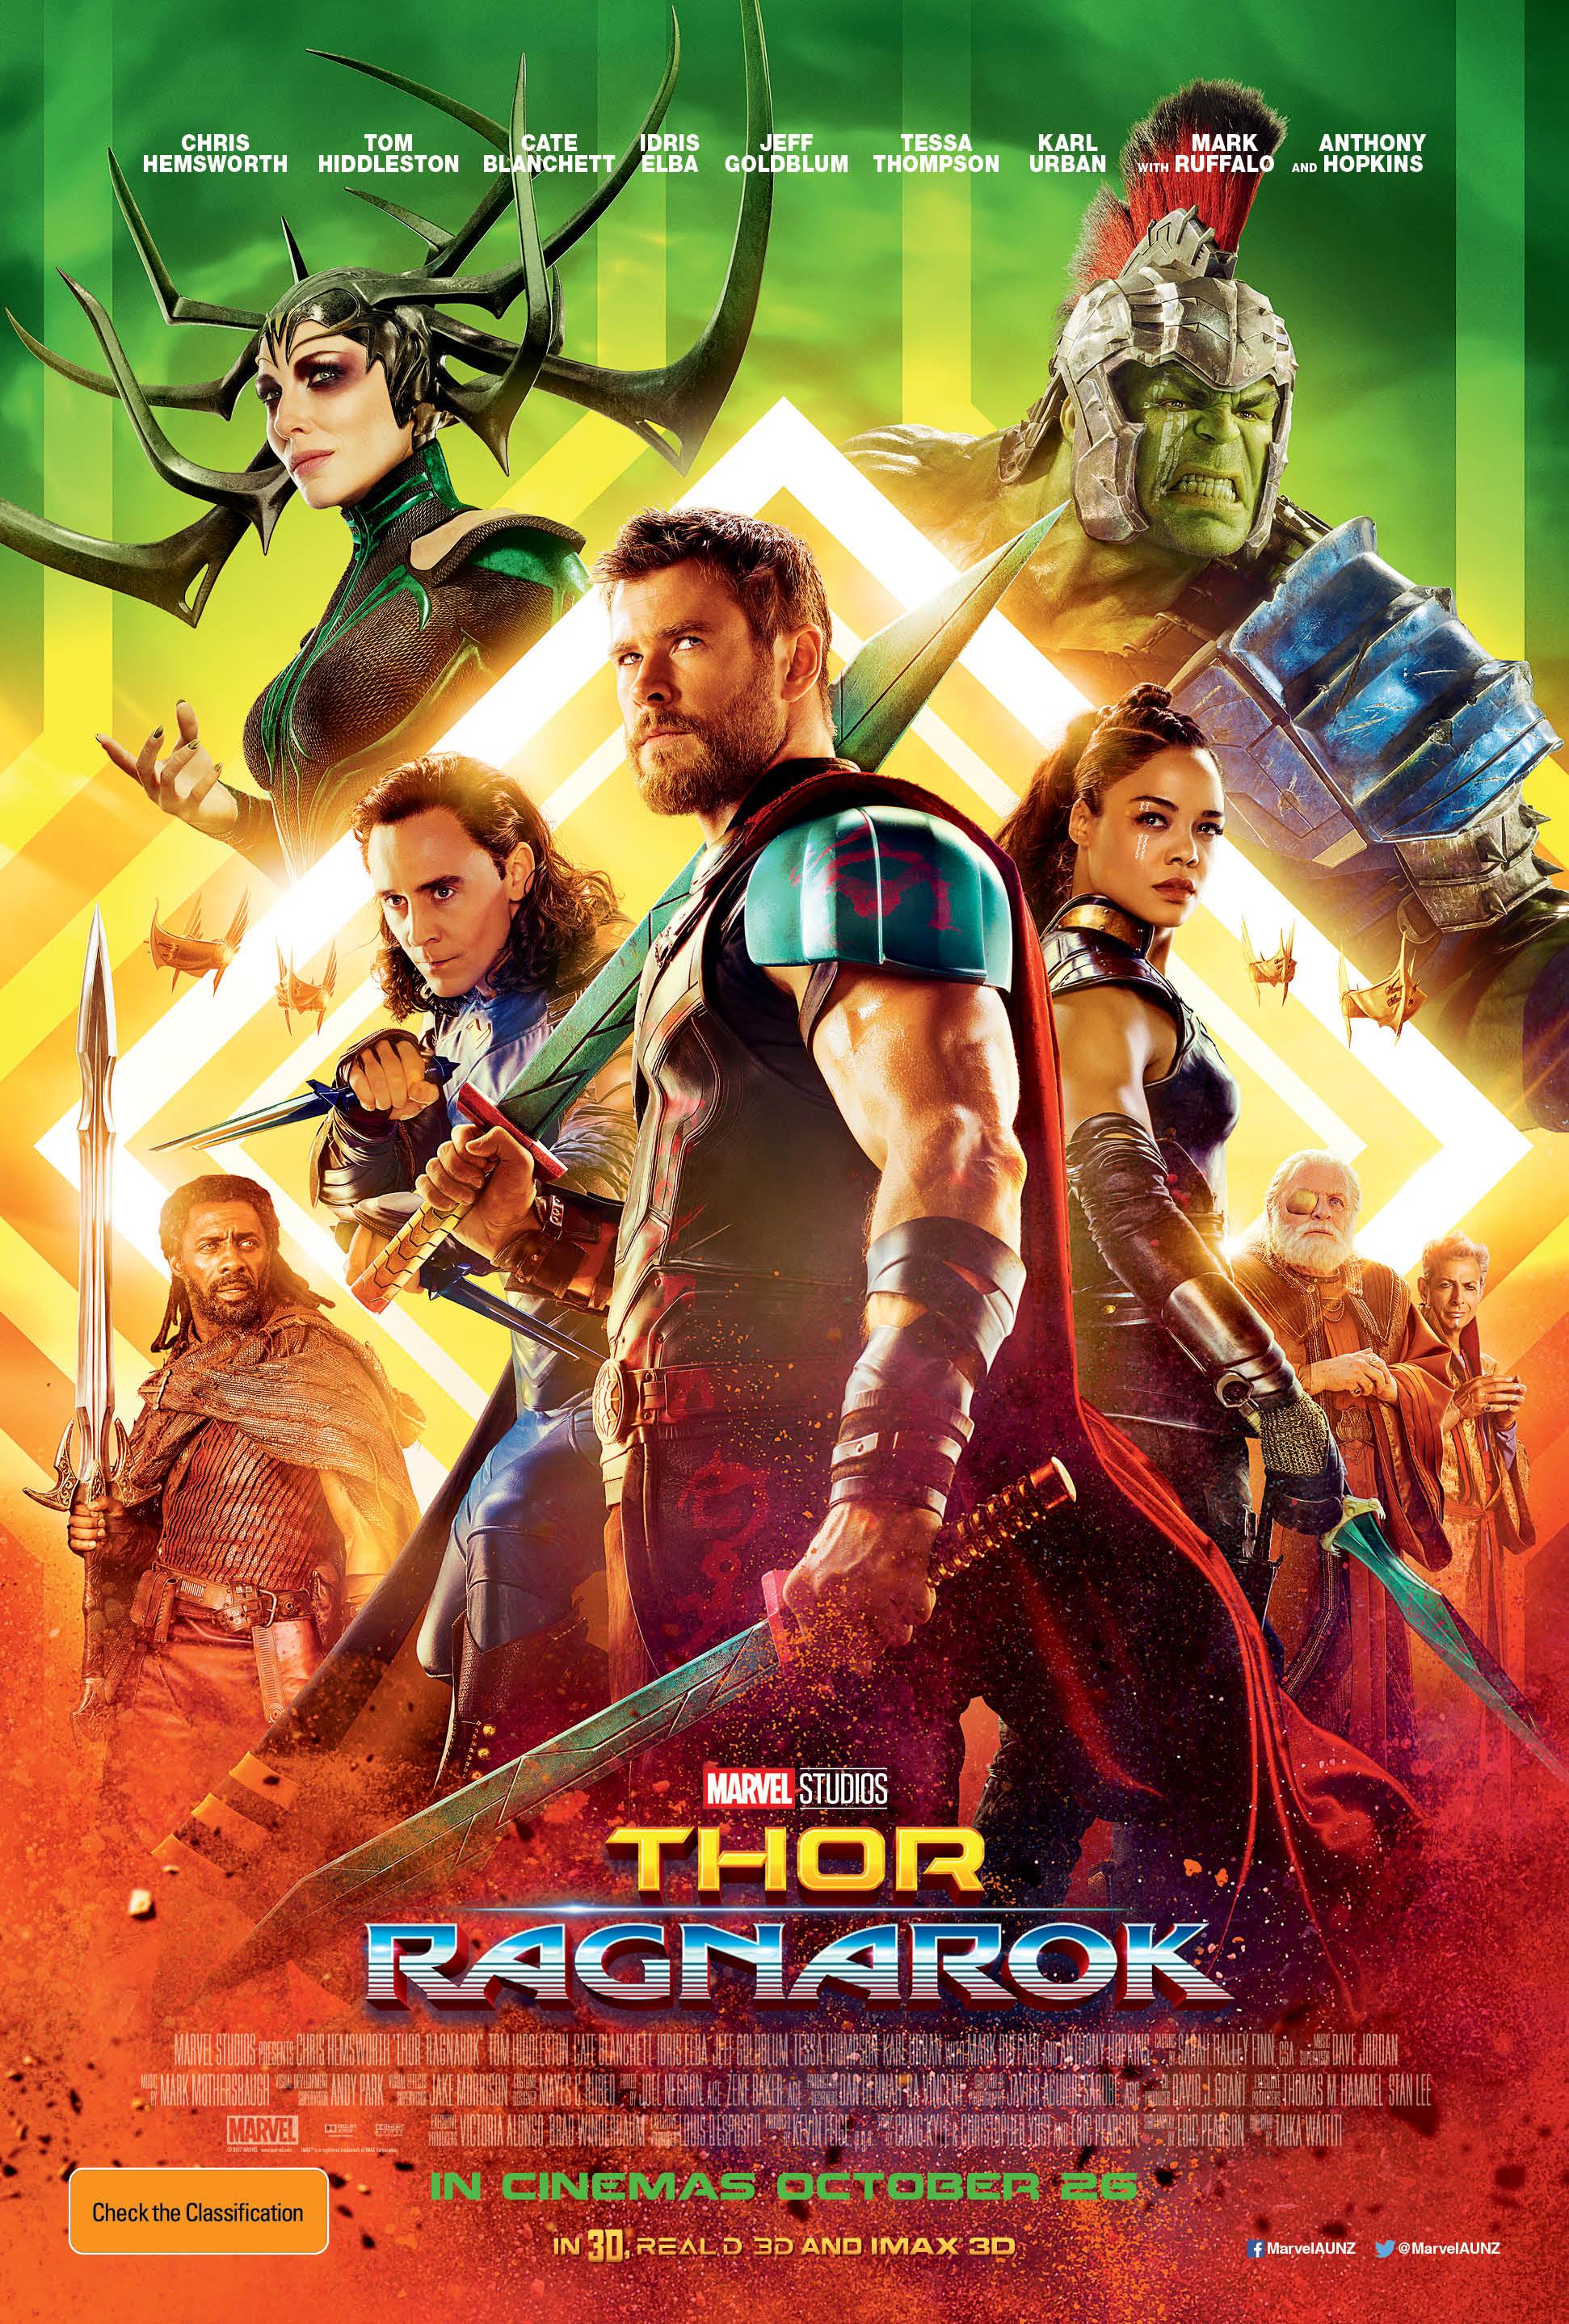 Thor Ragnarok Movie Poster image